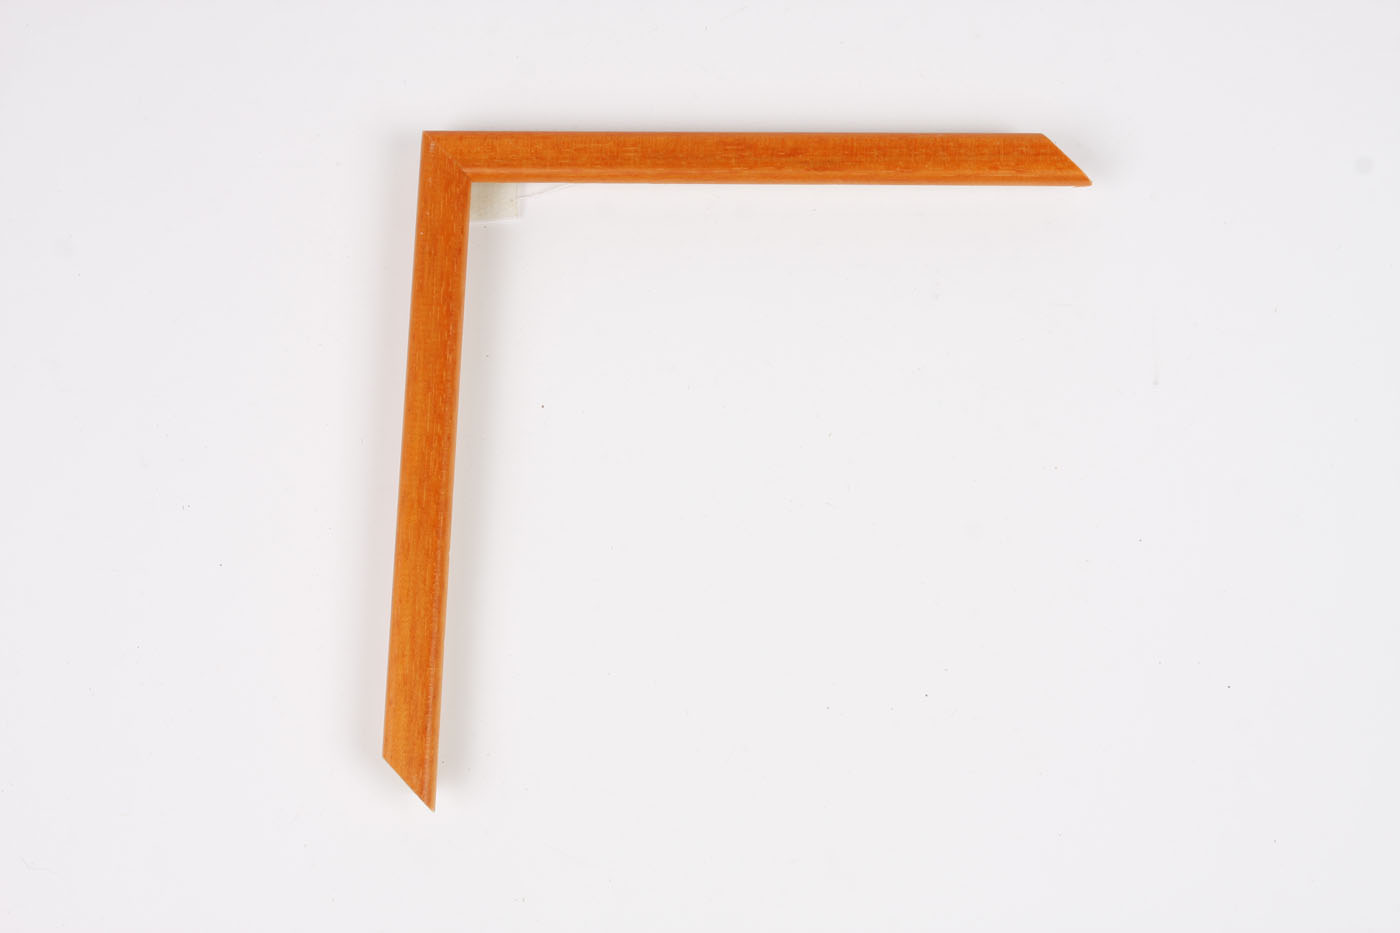 04142-112-NARAJA-ancho1,5cm